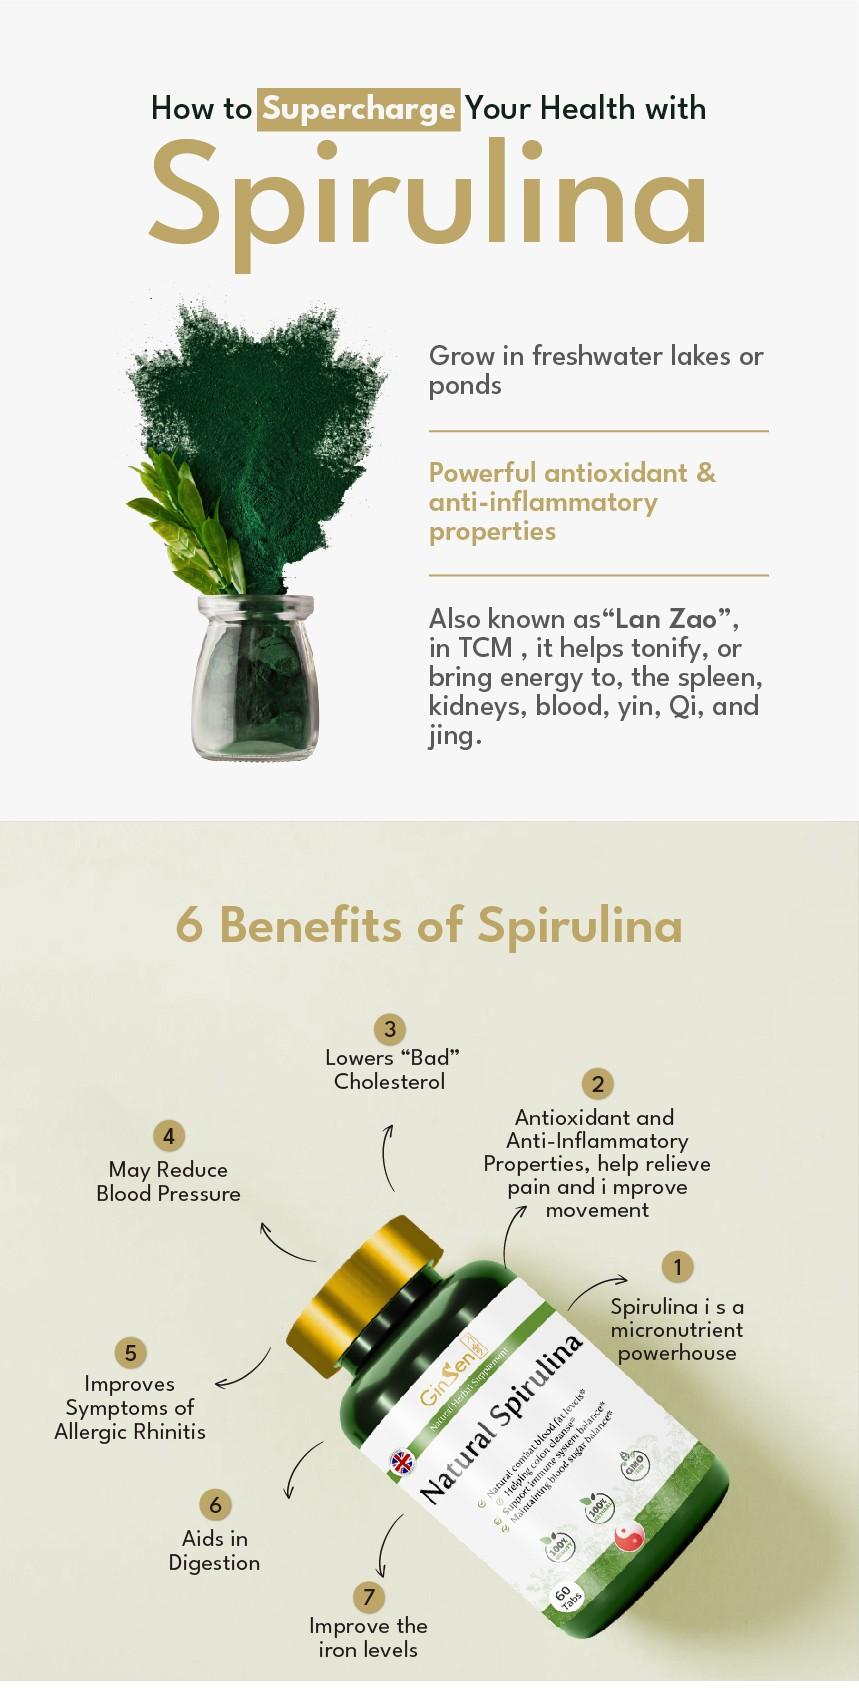 benefits of Spirulina